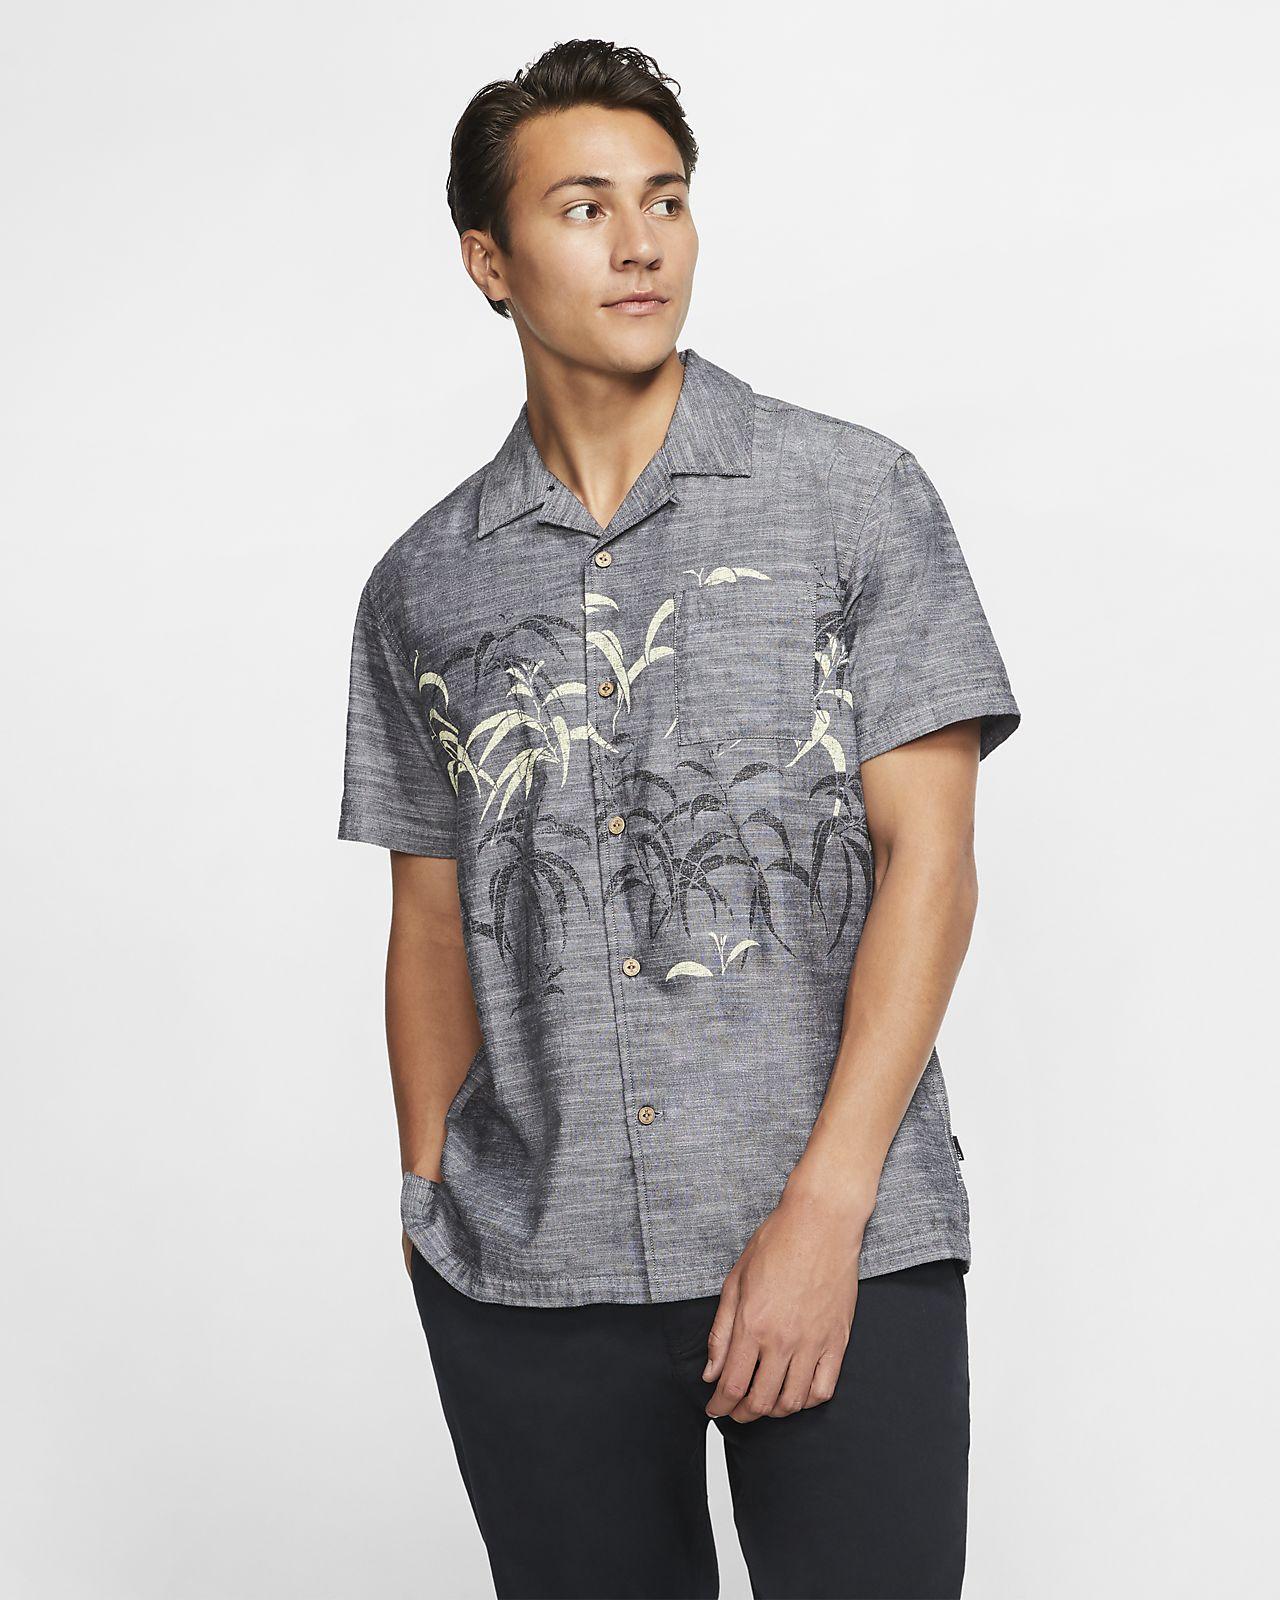 Hurley Sig Zane Kalaukoa Men's Short-Sleeve Top